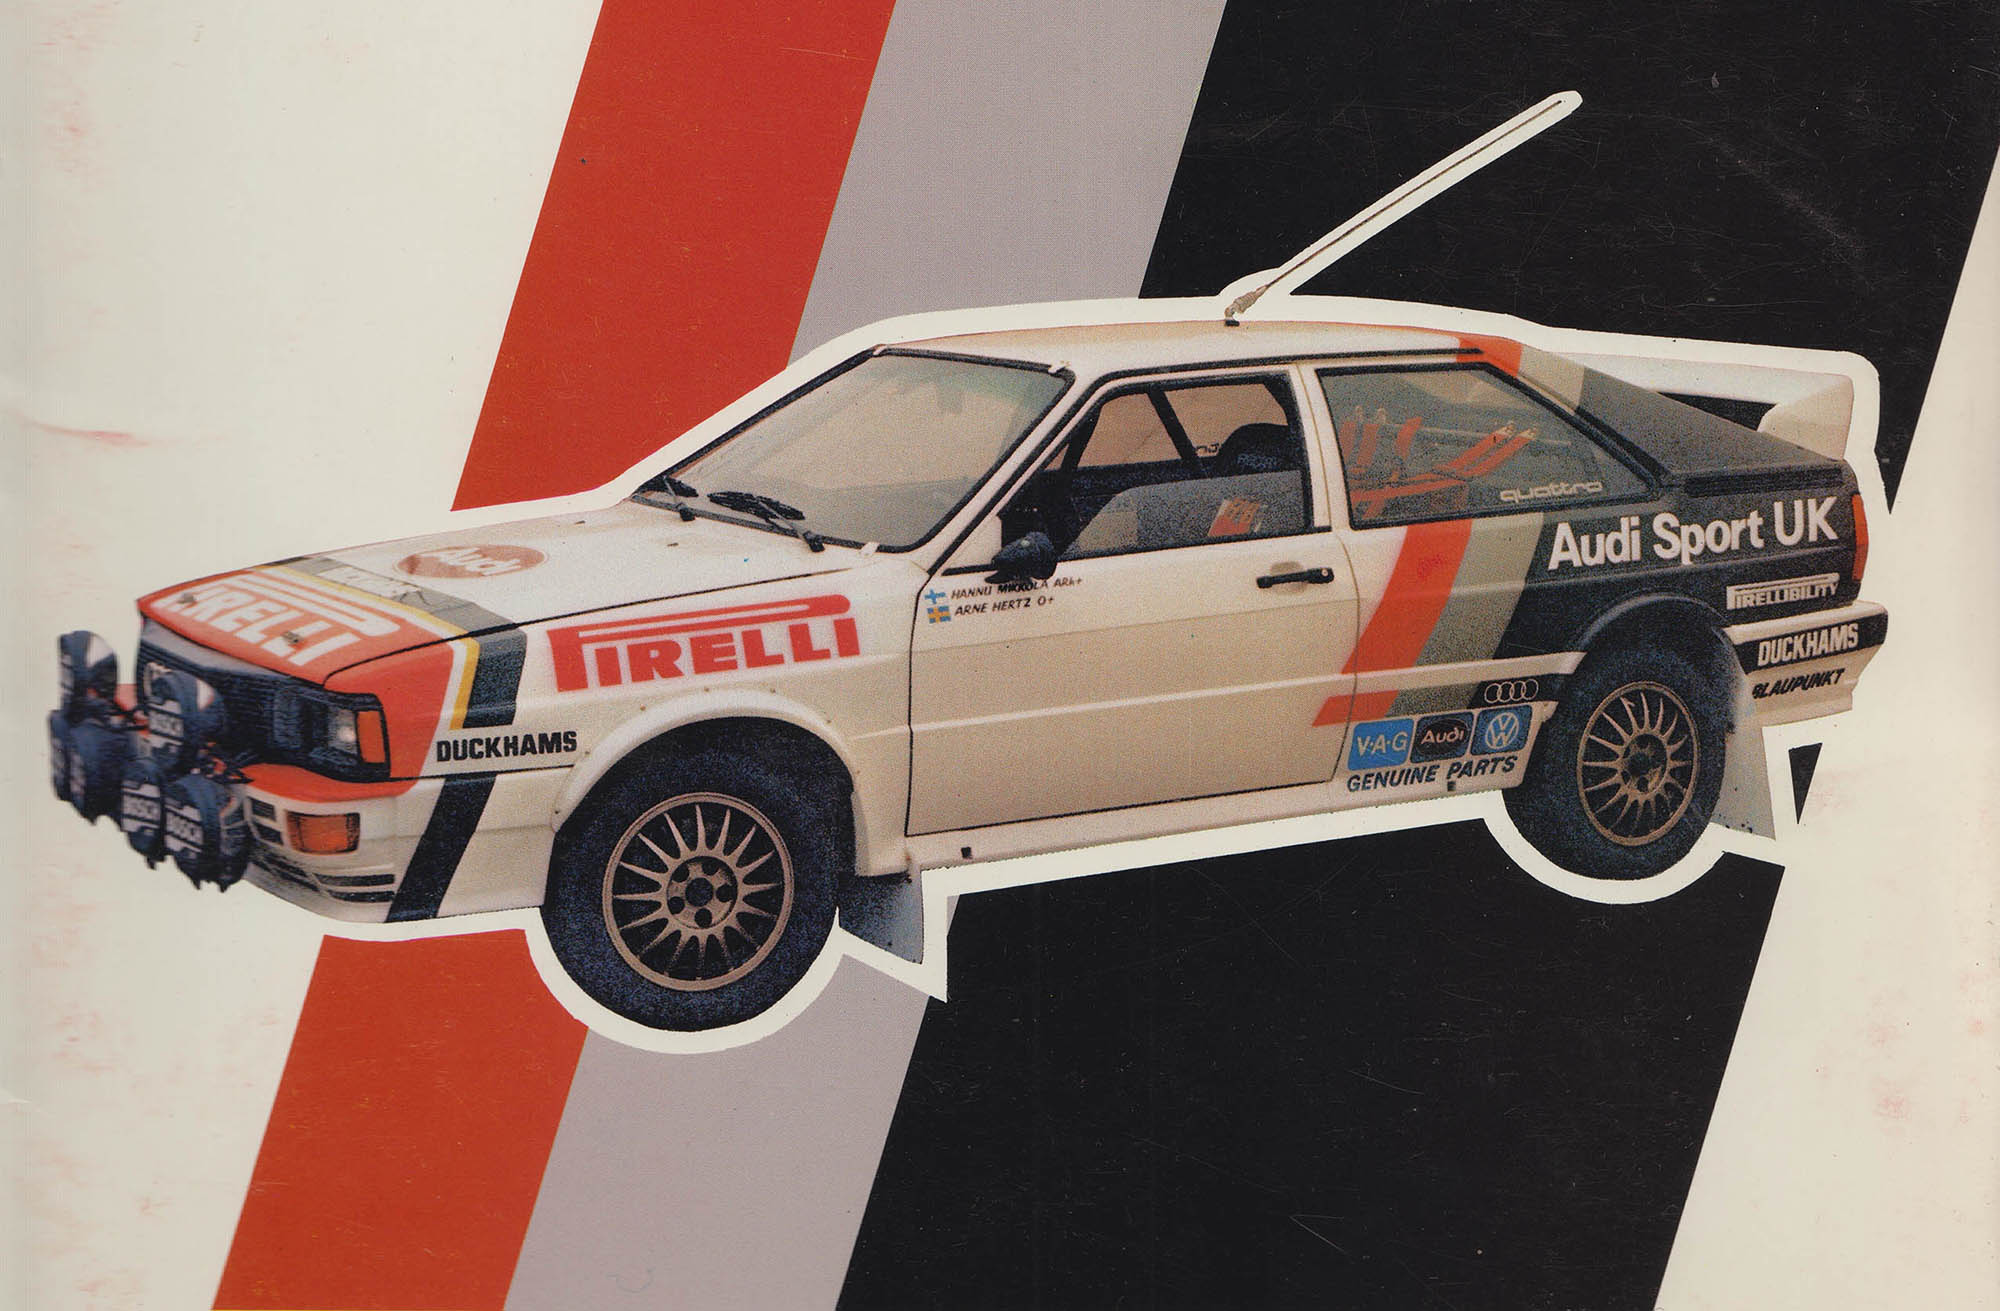 Audi Sport UK Press Release 28/10/1981